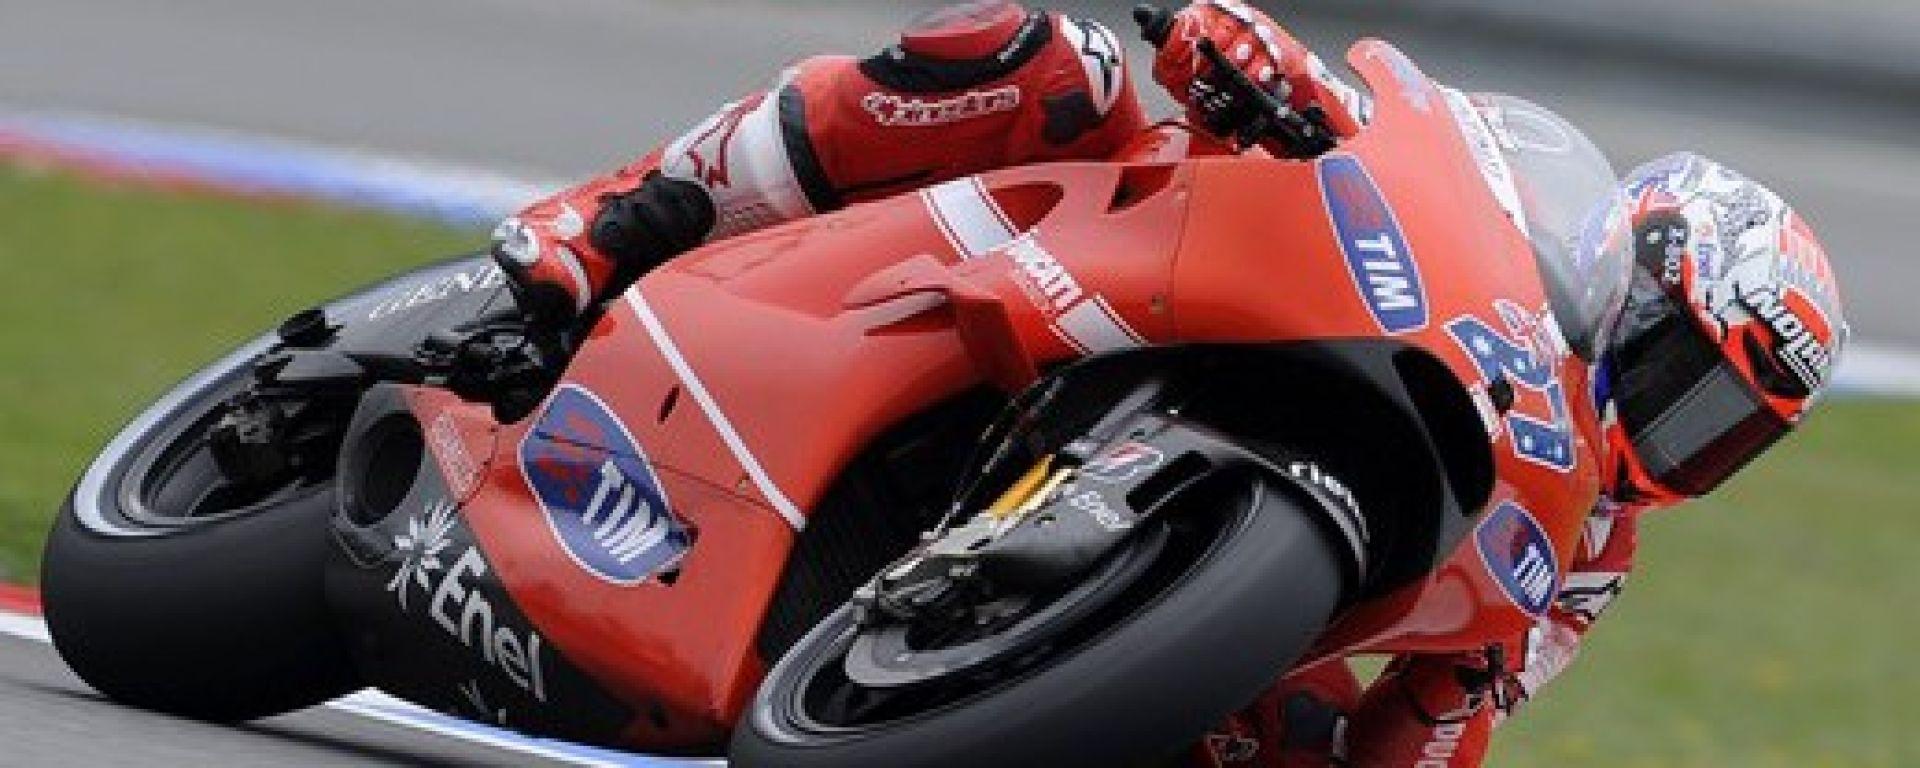 MotoGP 2010: GP di Repubblica Ceca